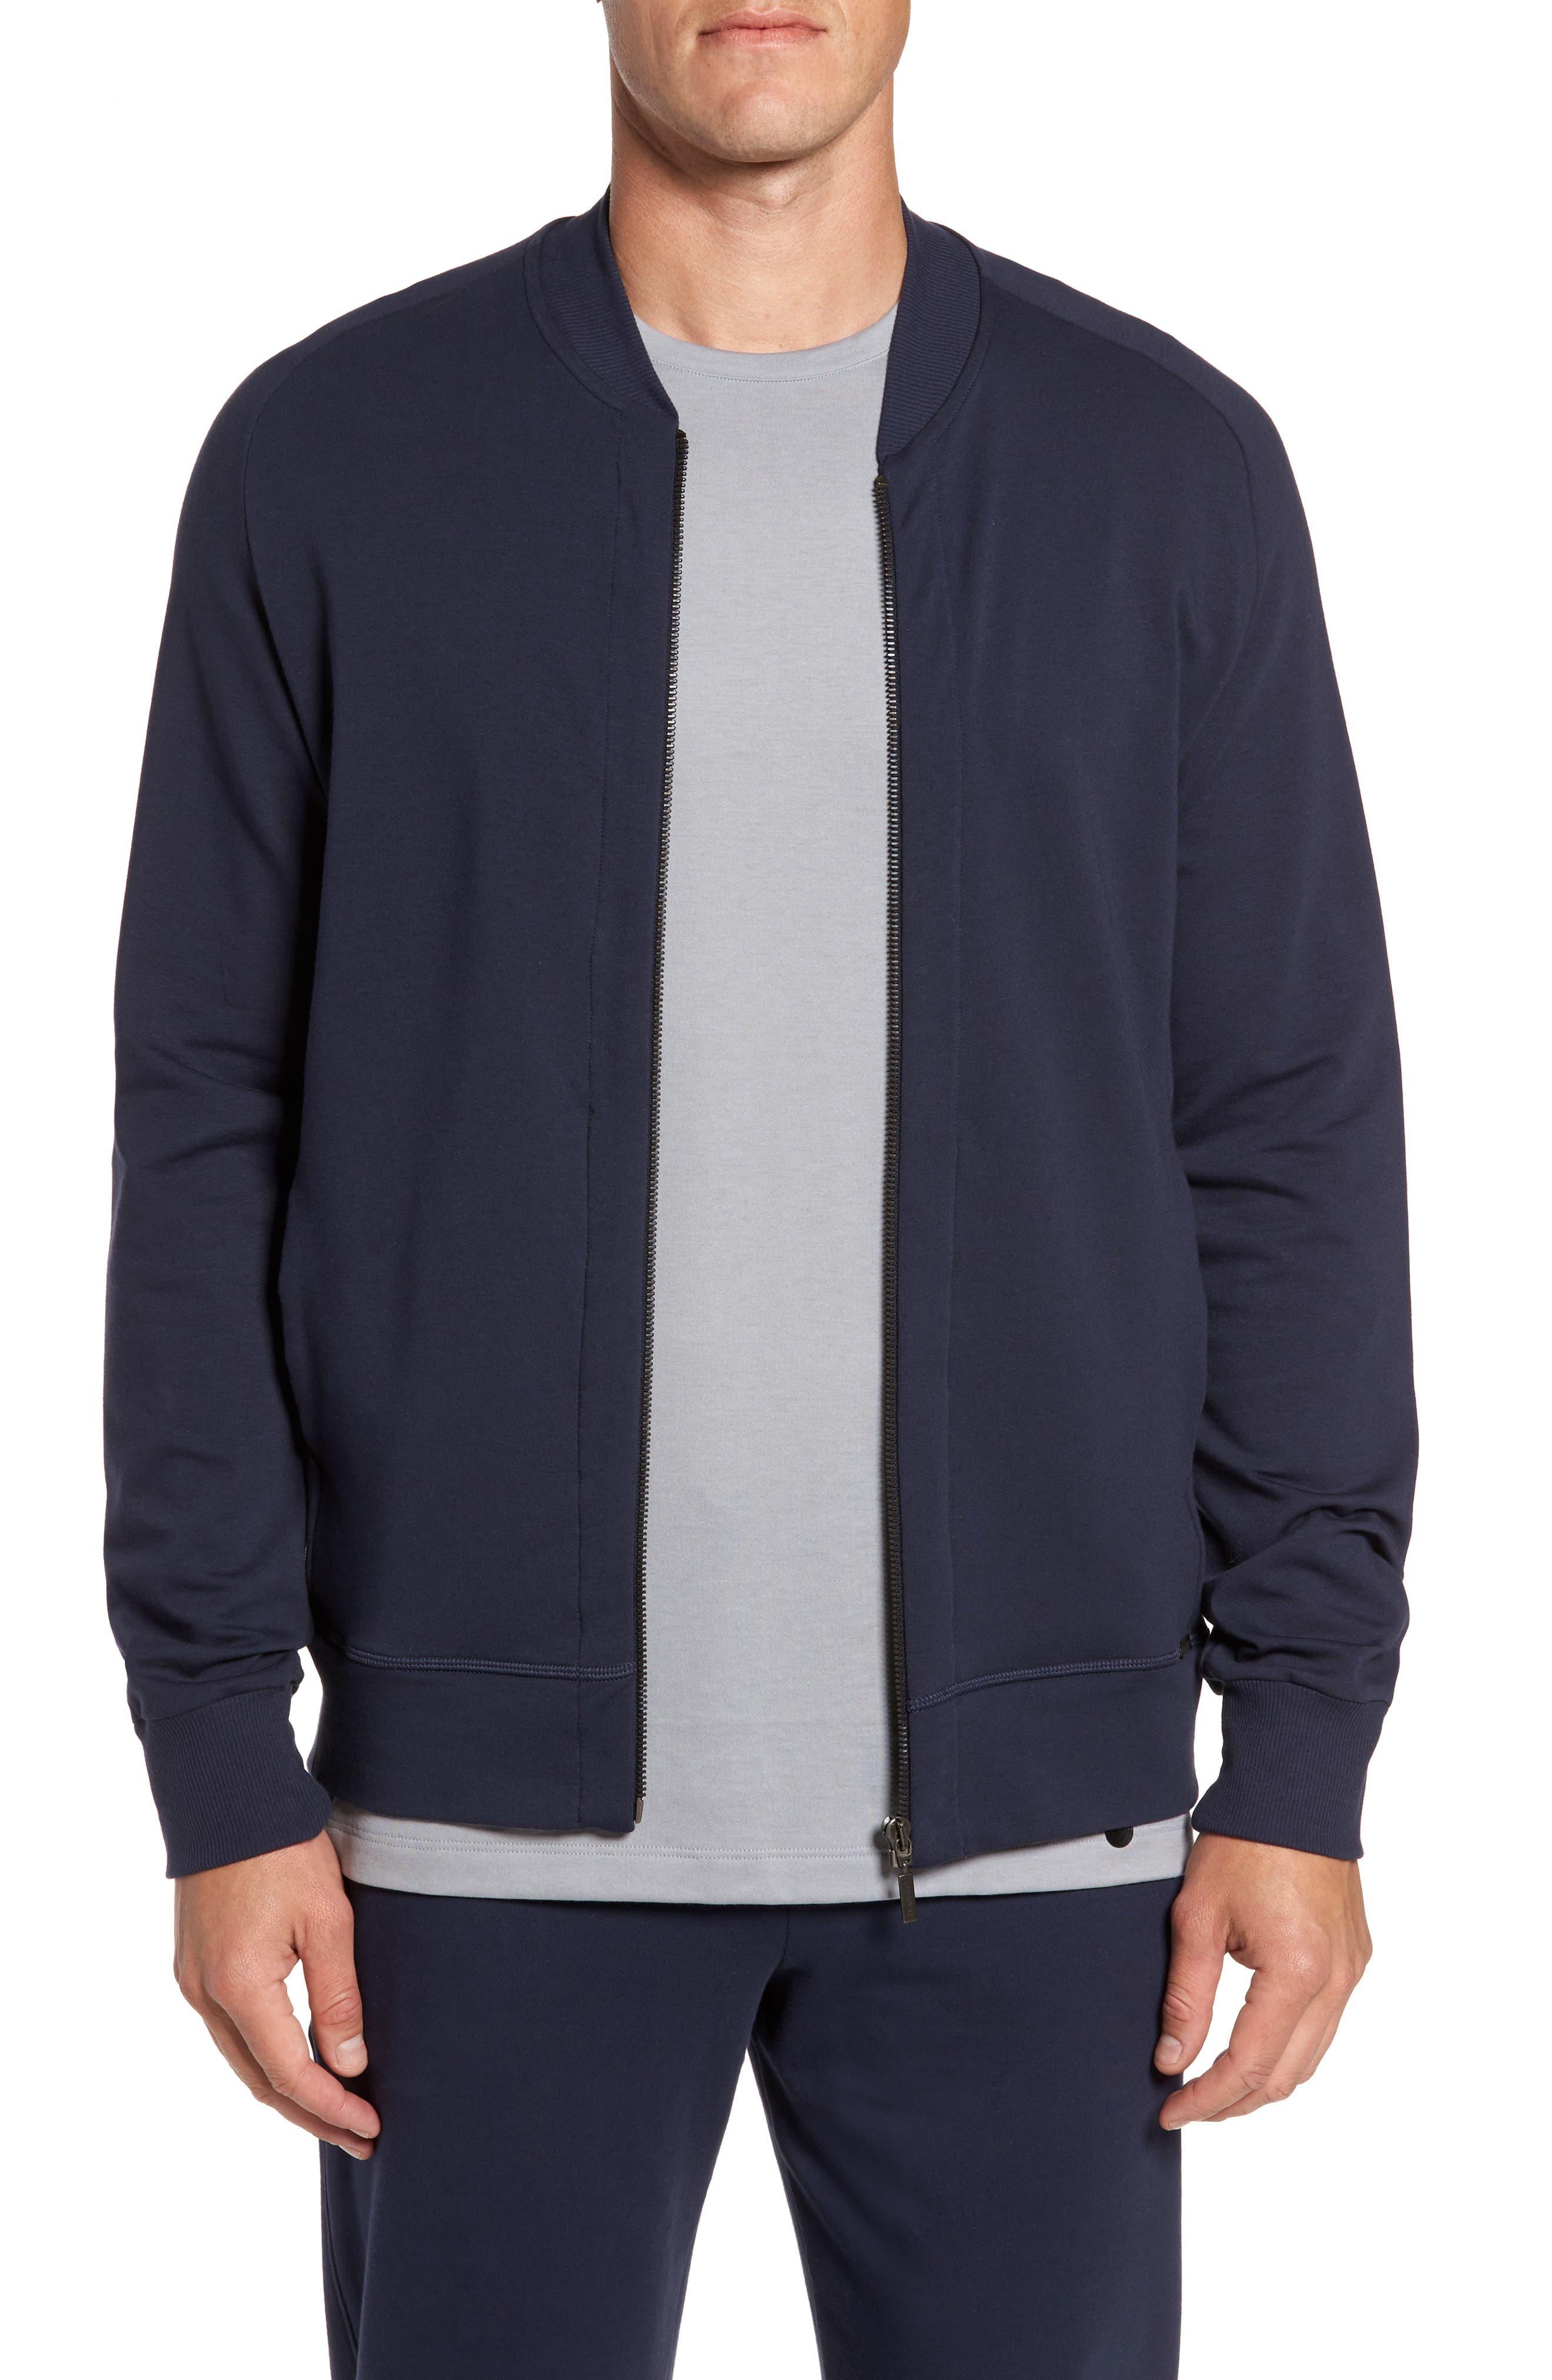 Hanro Living Zip Bomber Jacket